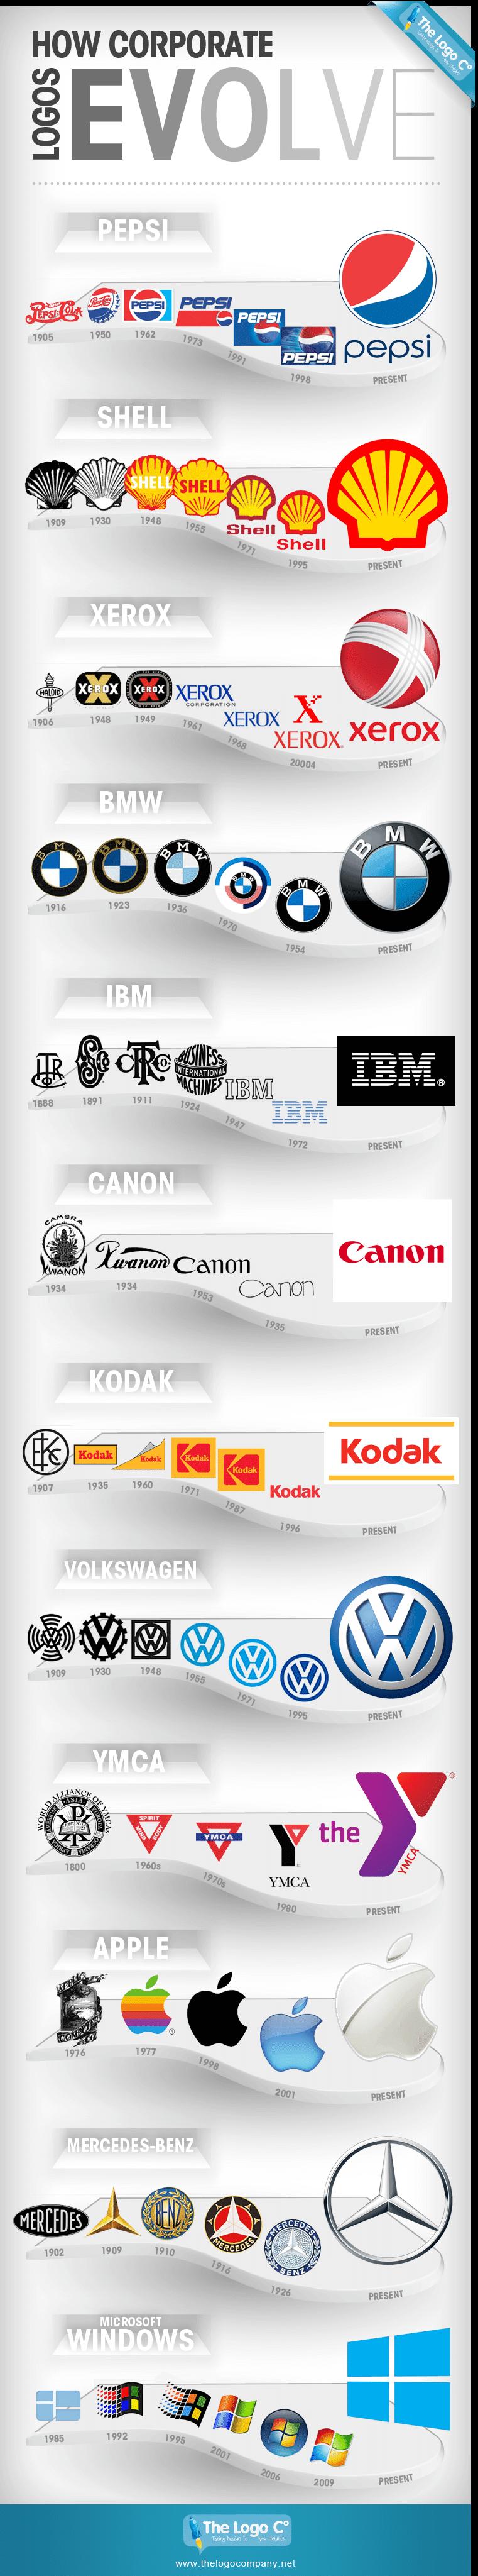 Evolution des logos de marque Apple Microsoft BMW